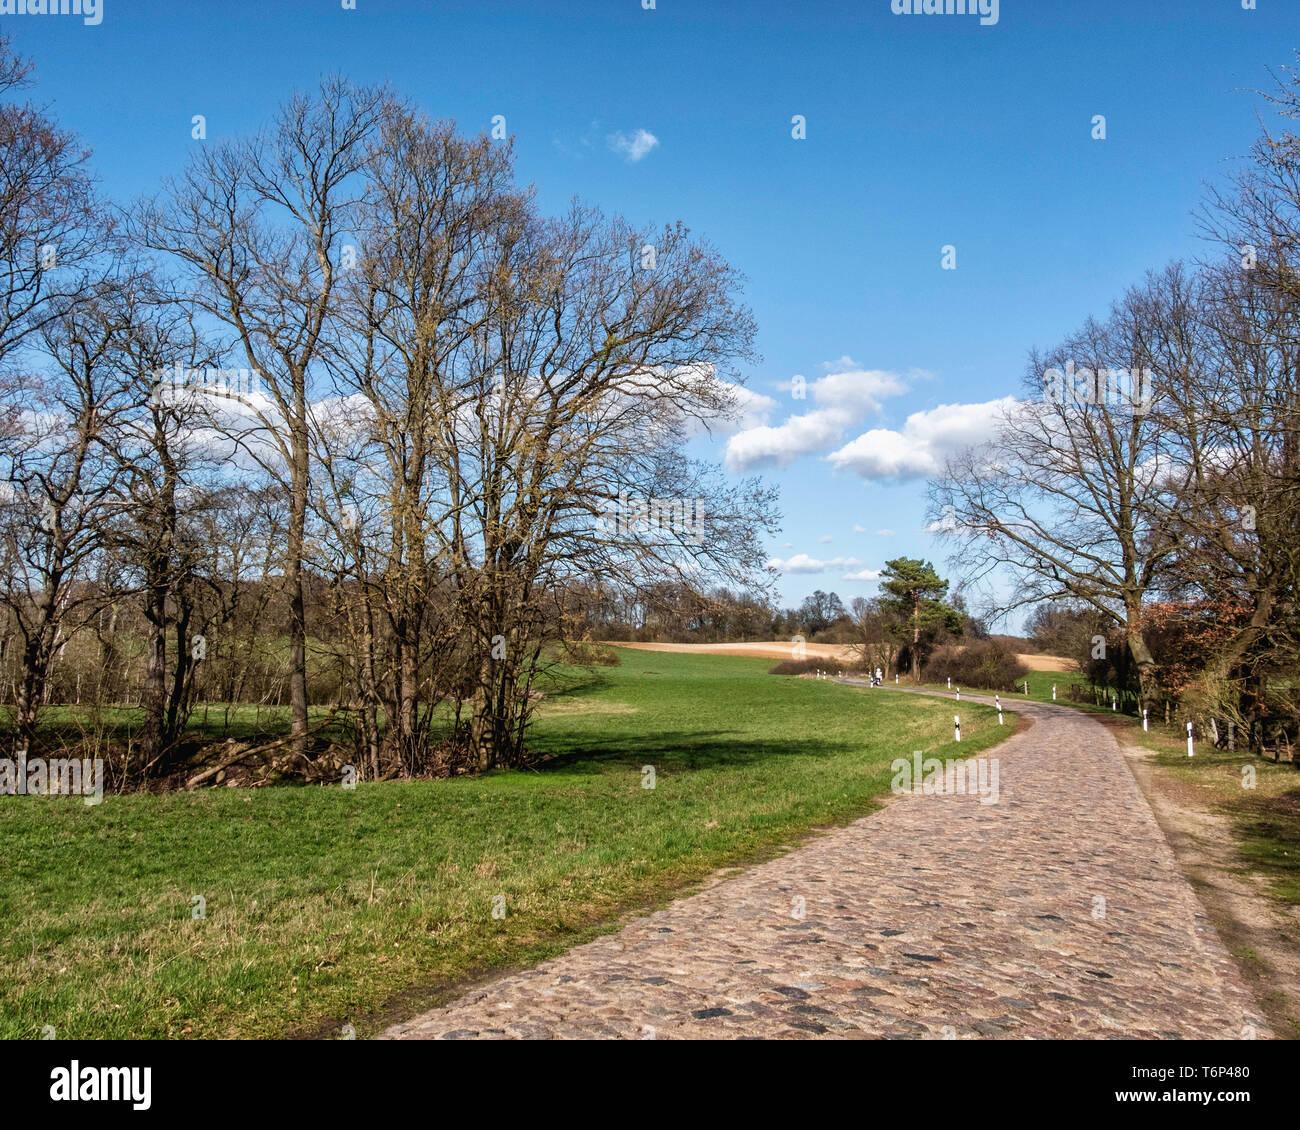 Grassy meadows & bare trees next to Luisenhof cobbled road, Brandenburg, Germany - Stock Image